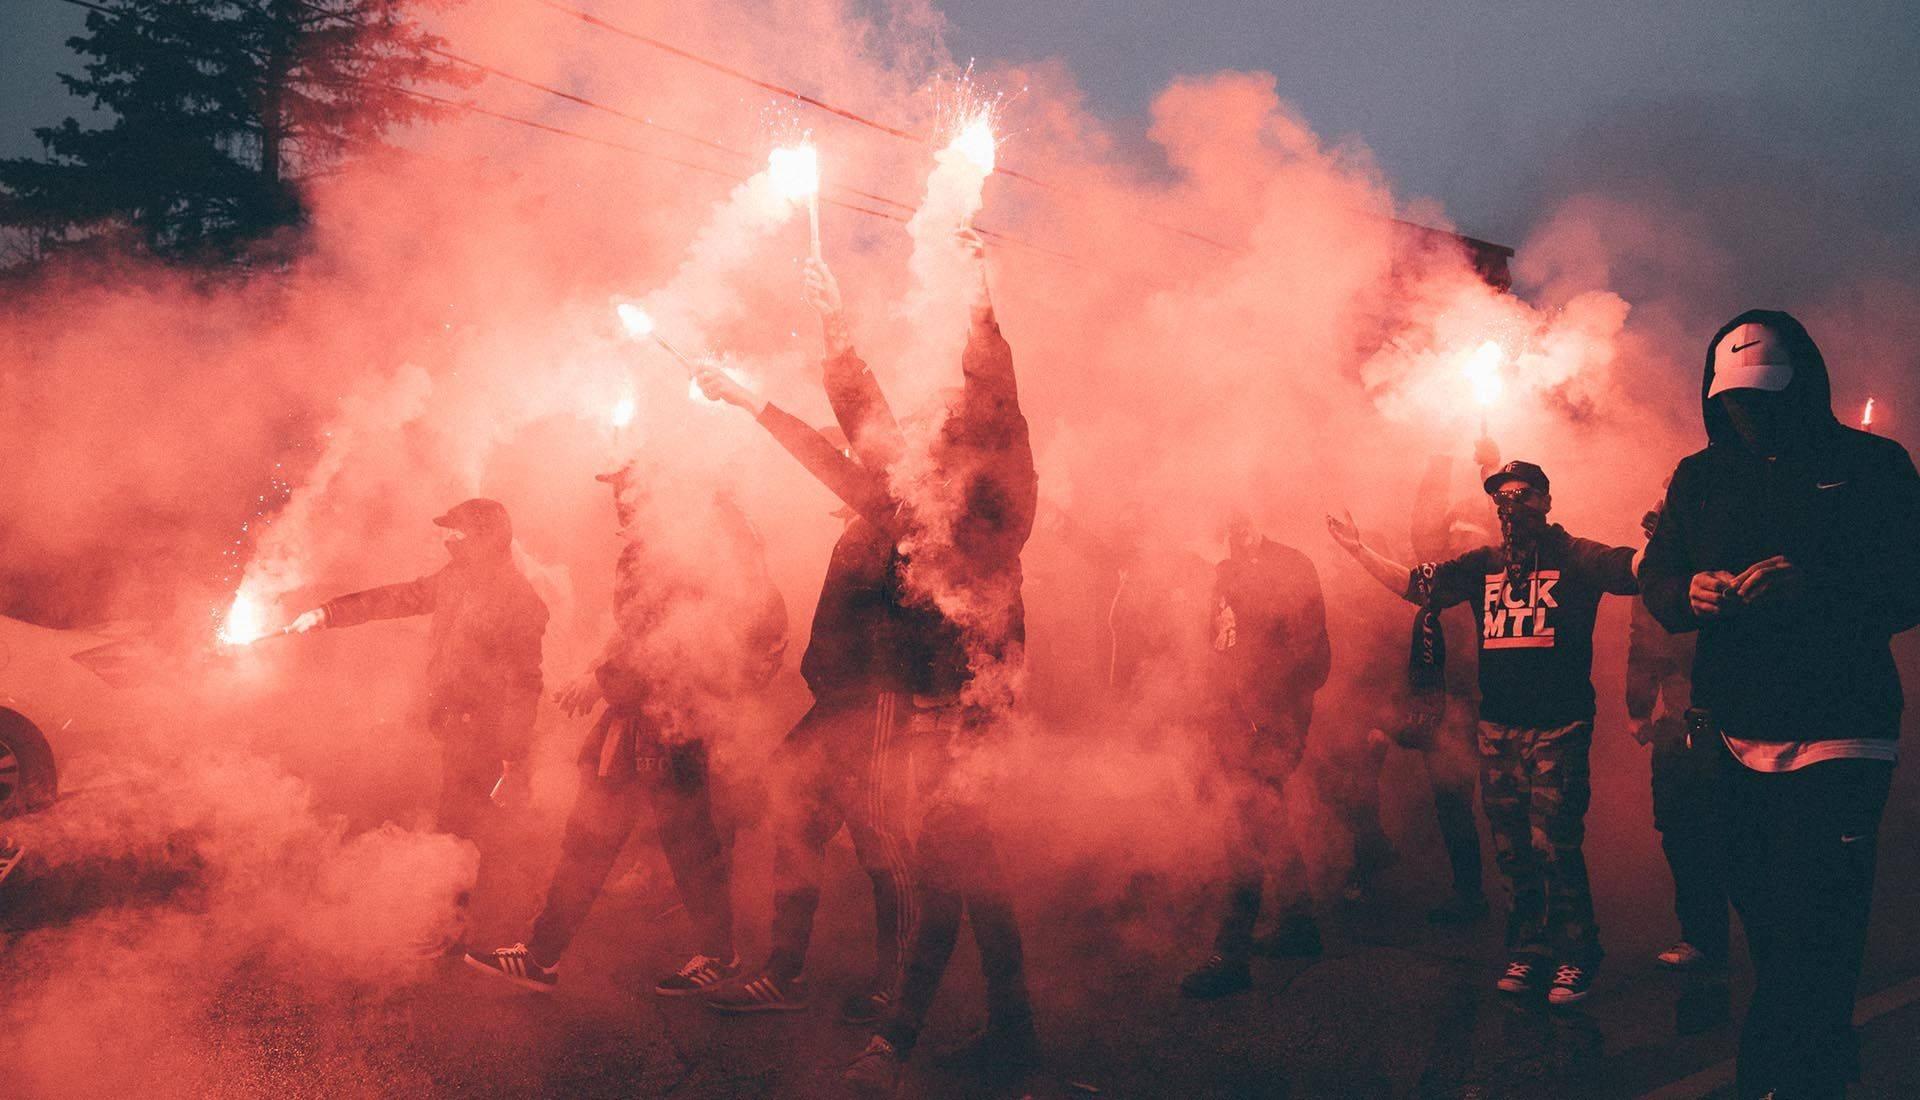 Нью-Йорк Ред Буллз ФК Торонто - Stone Forest